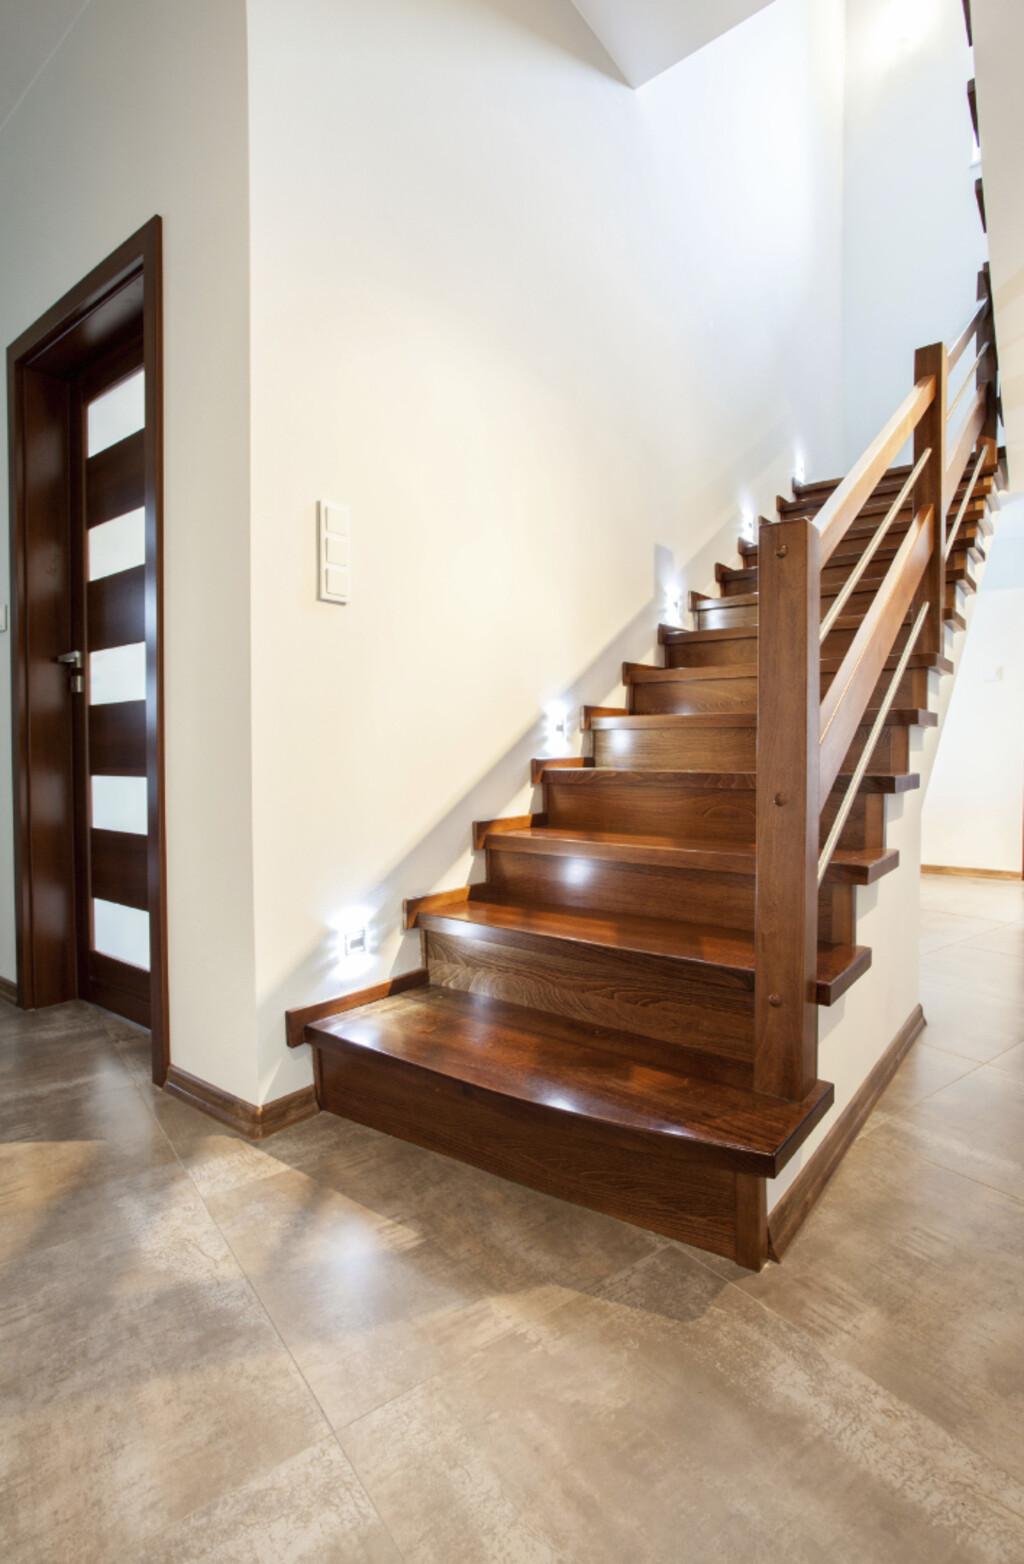 Limia - Fotos de escaleras modernas ...